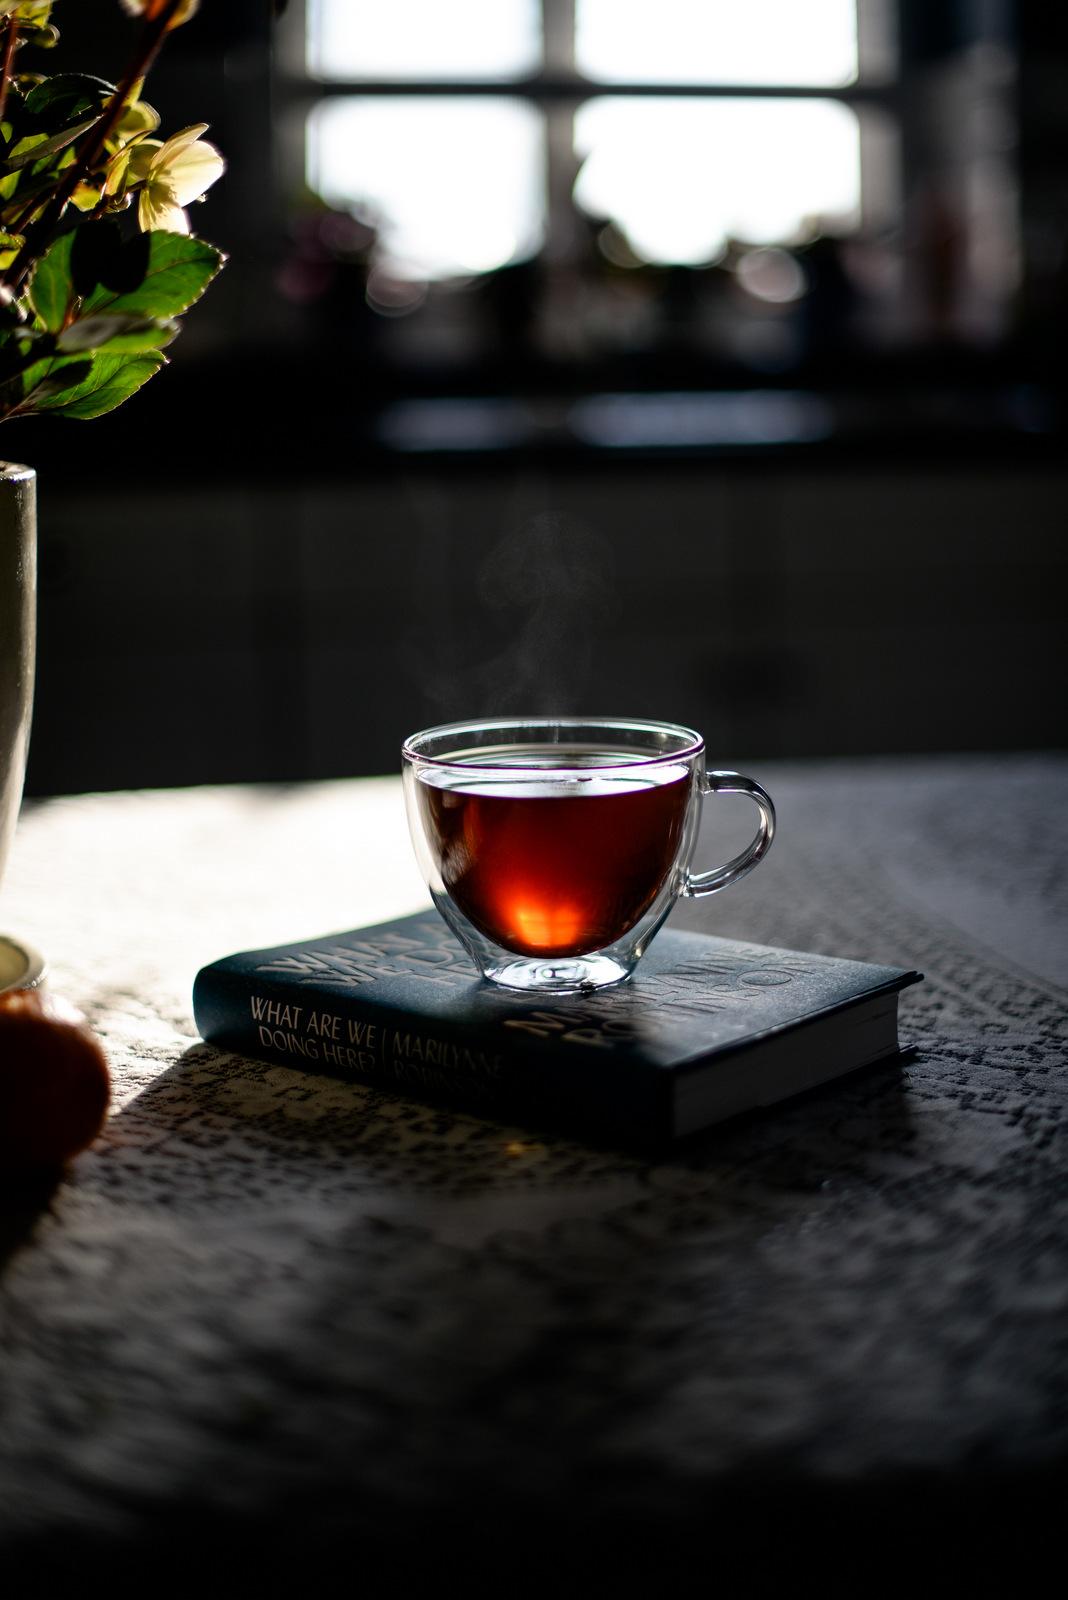 tea and Marilynne Robinson book